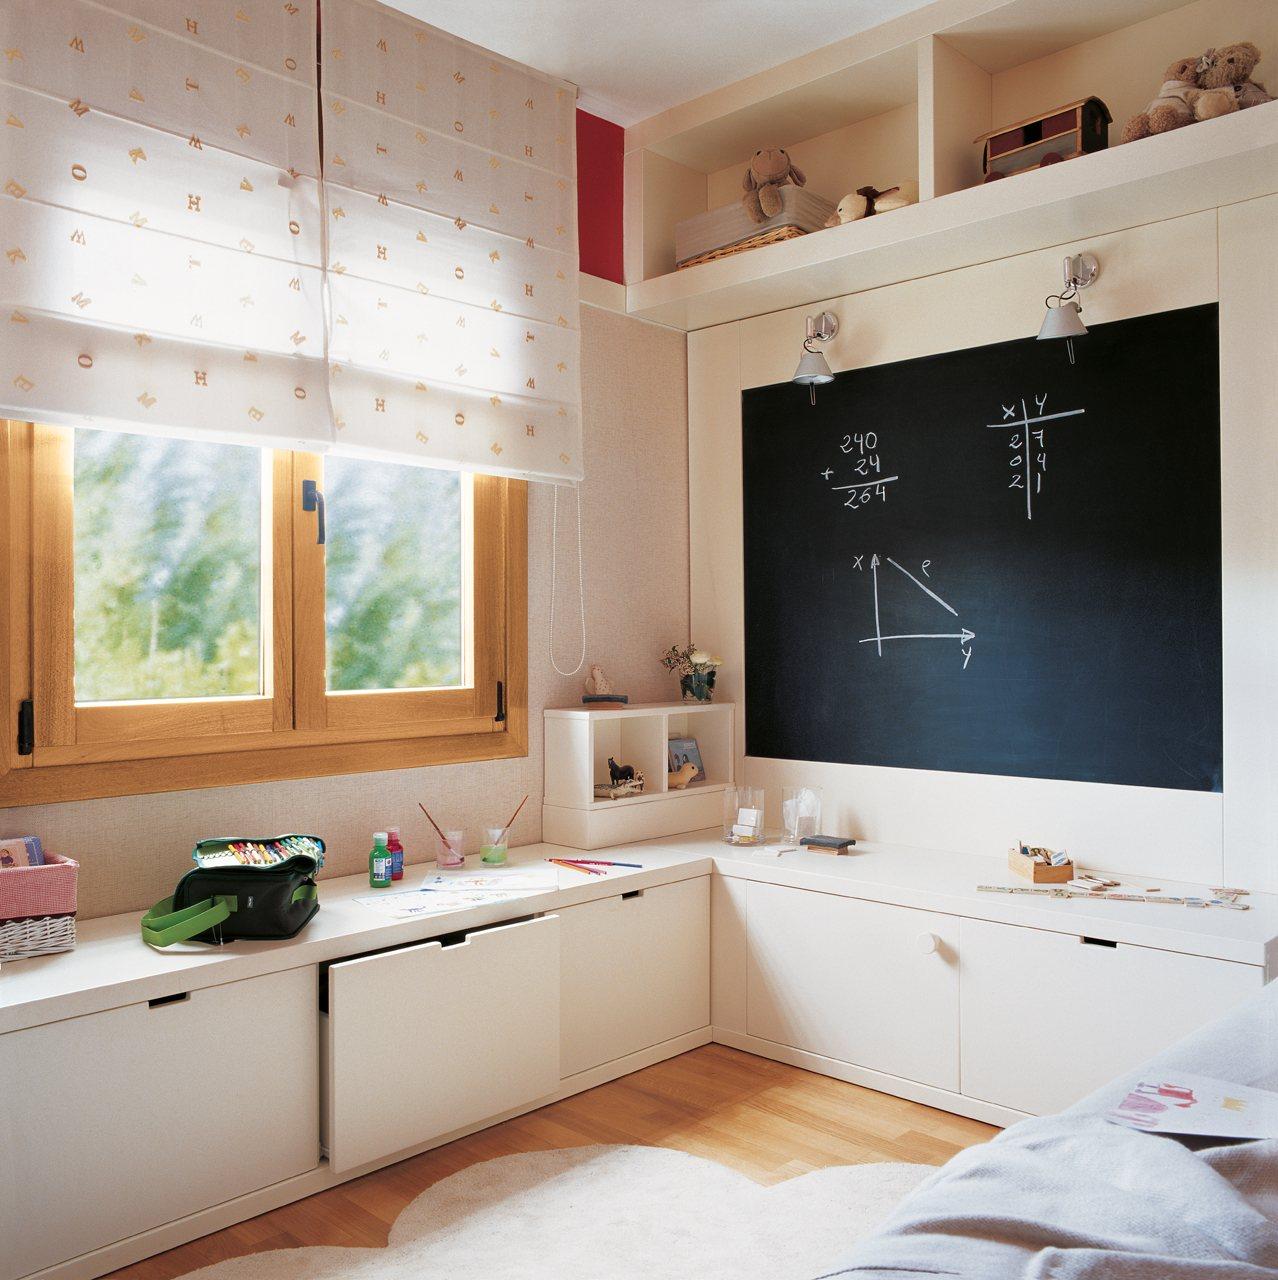 Детская комната для девочки со шкафами